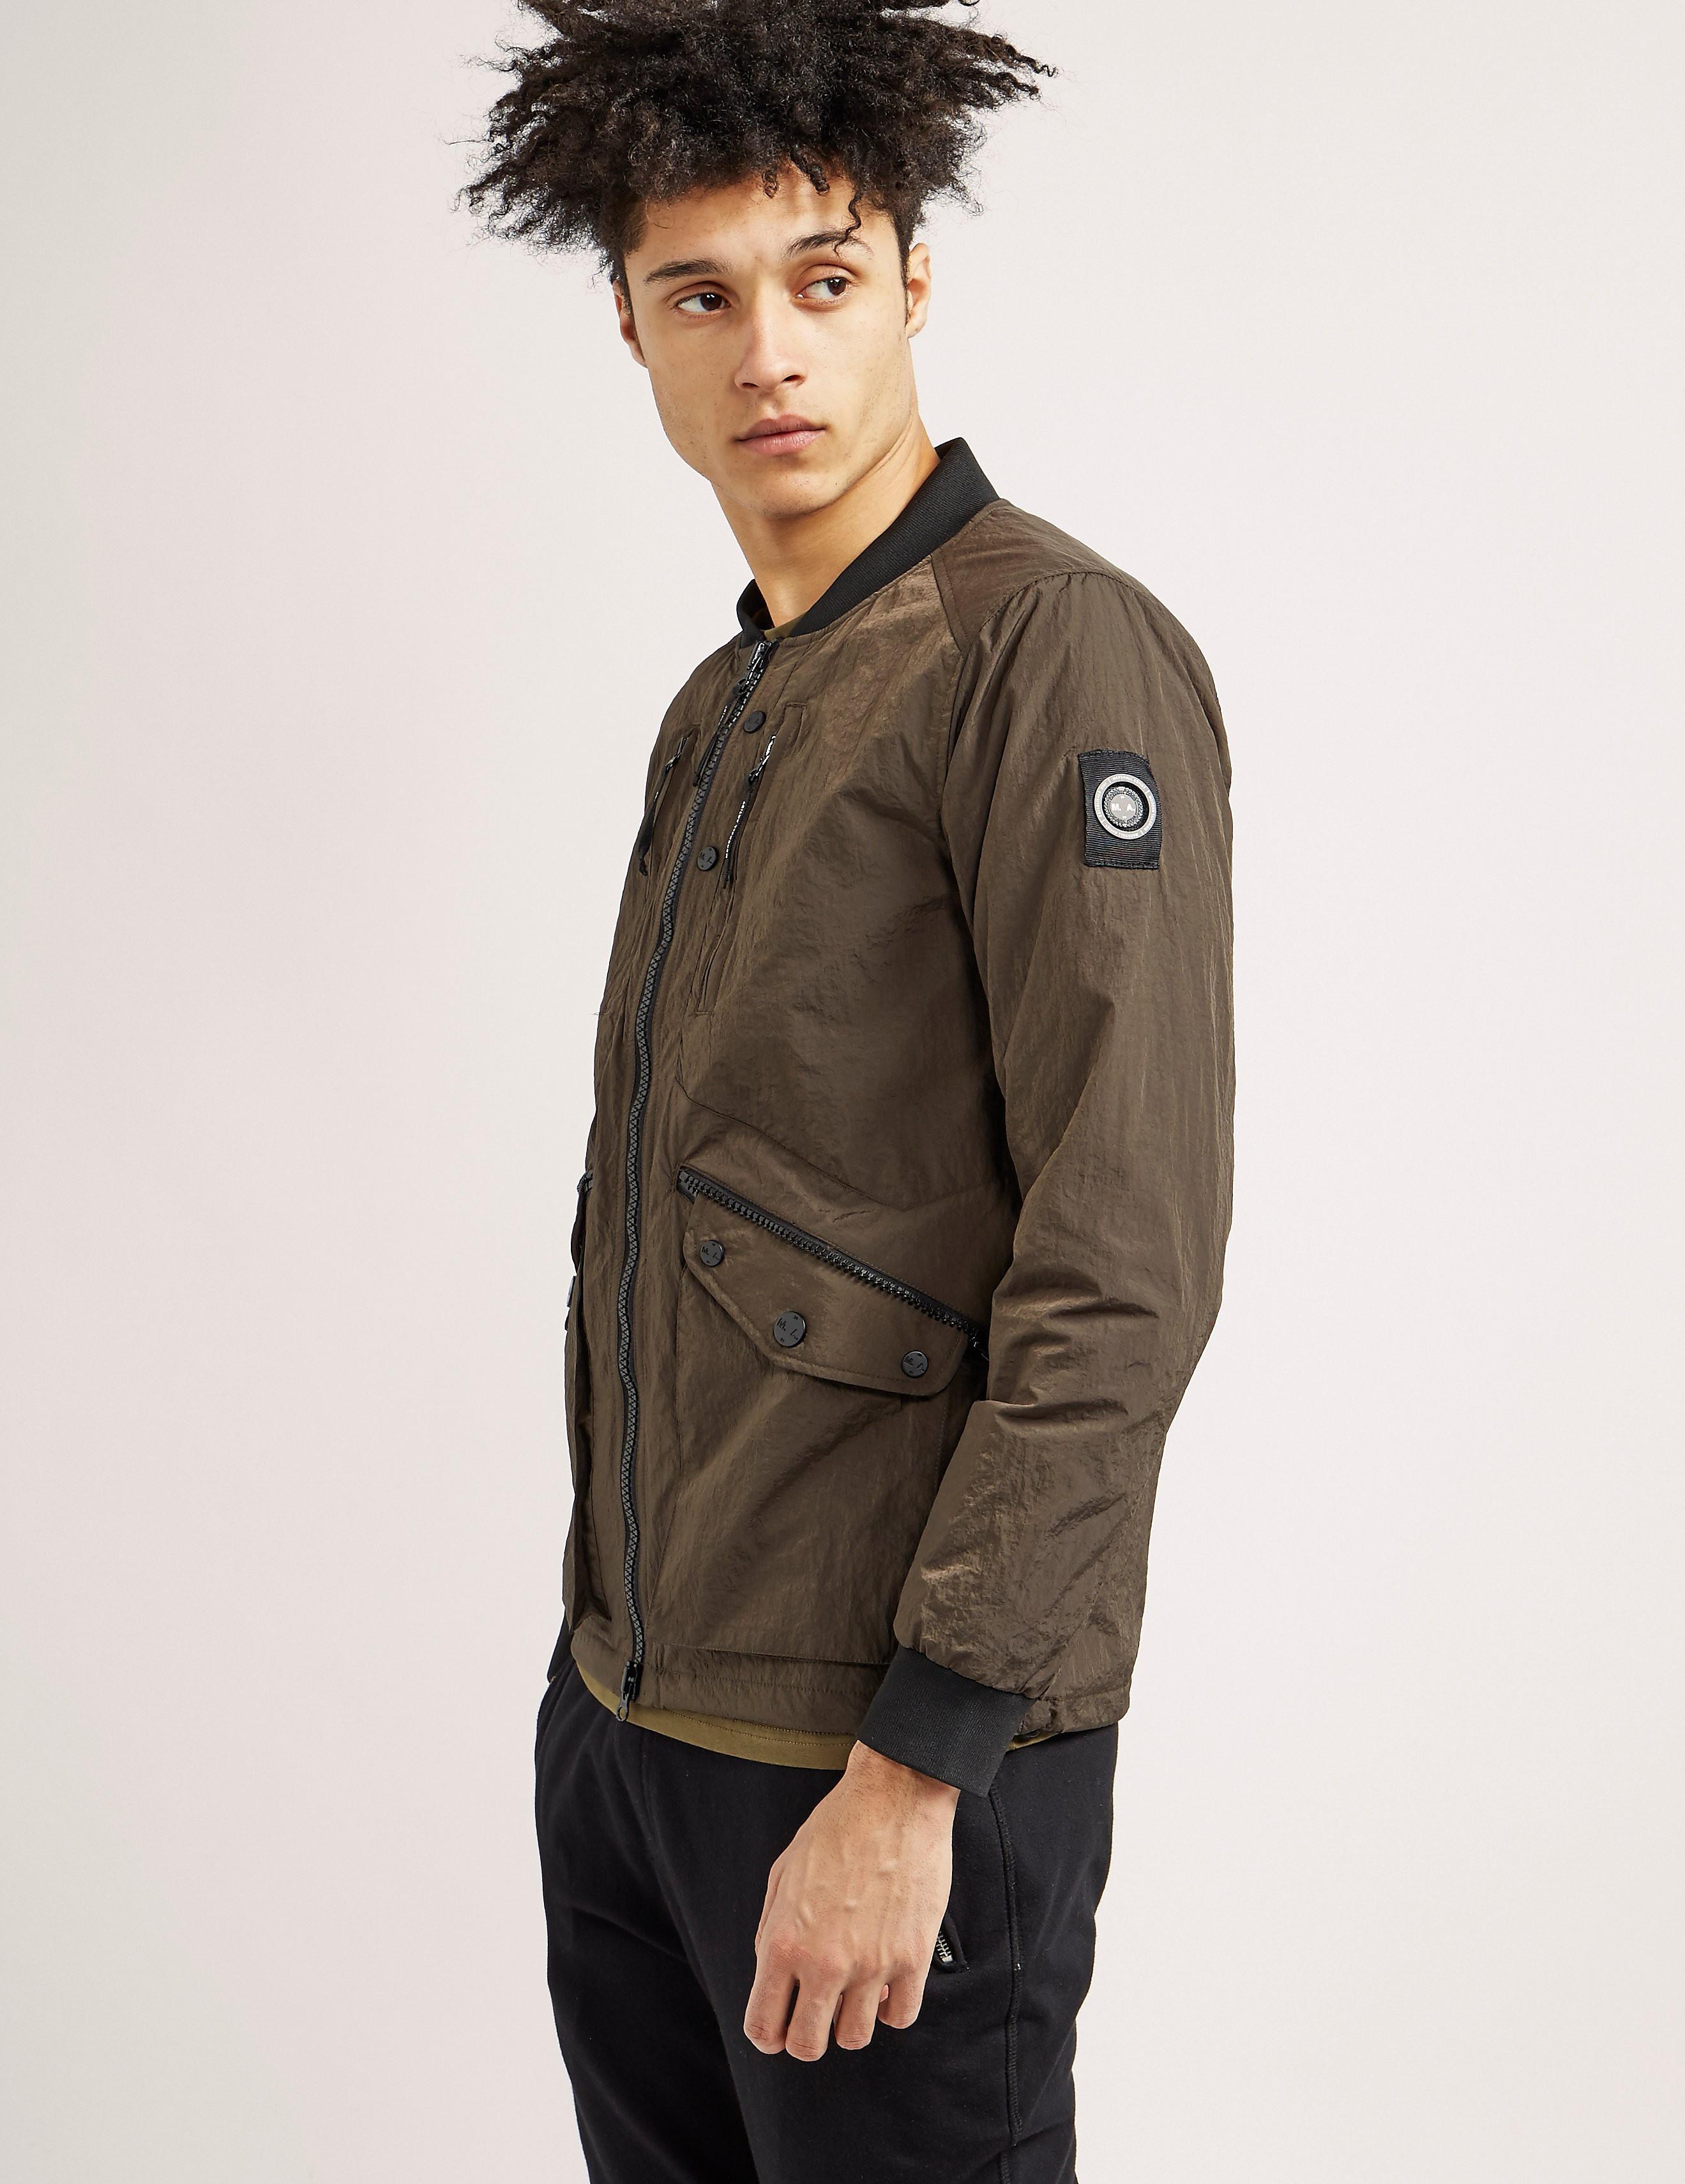 Marshall Artist Compact Bomber Jacket